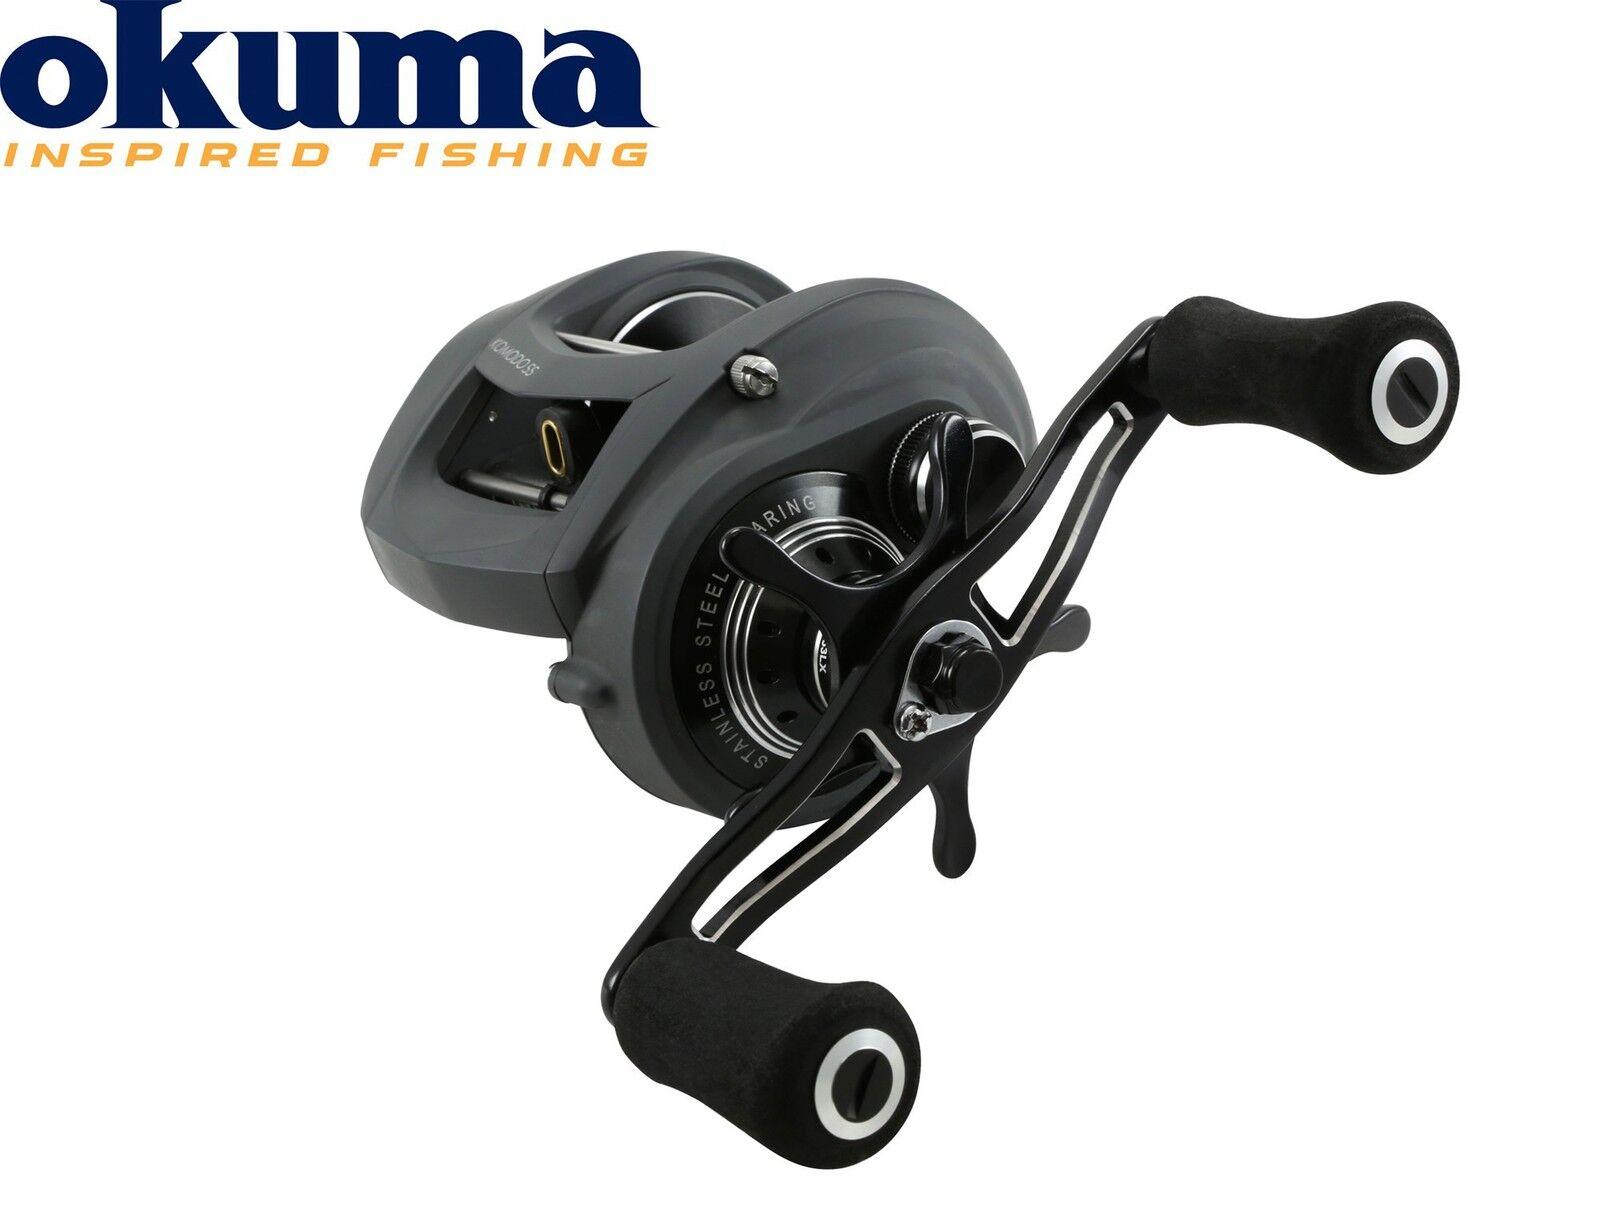 Okuma Komodo LP KDS-463LX - Niedrig Profile Multirolle, Baitcastrolle für Hecht